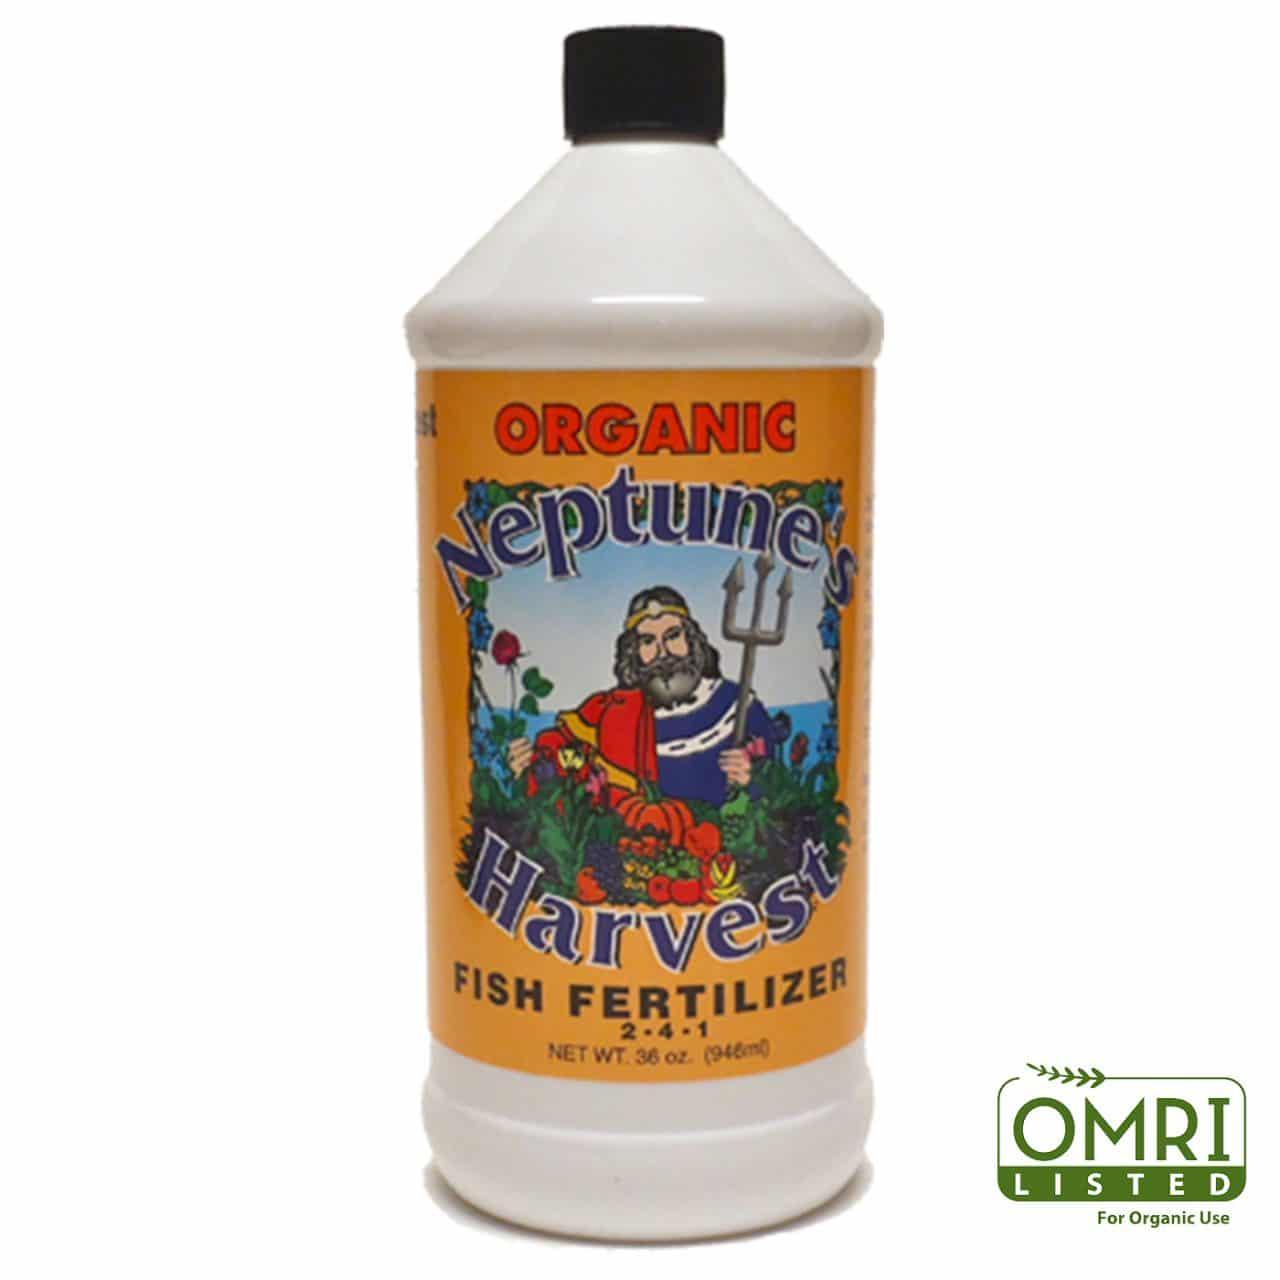 neptune's harvest hydrolyzed fish fertilizer one quart 2-4-1